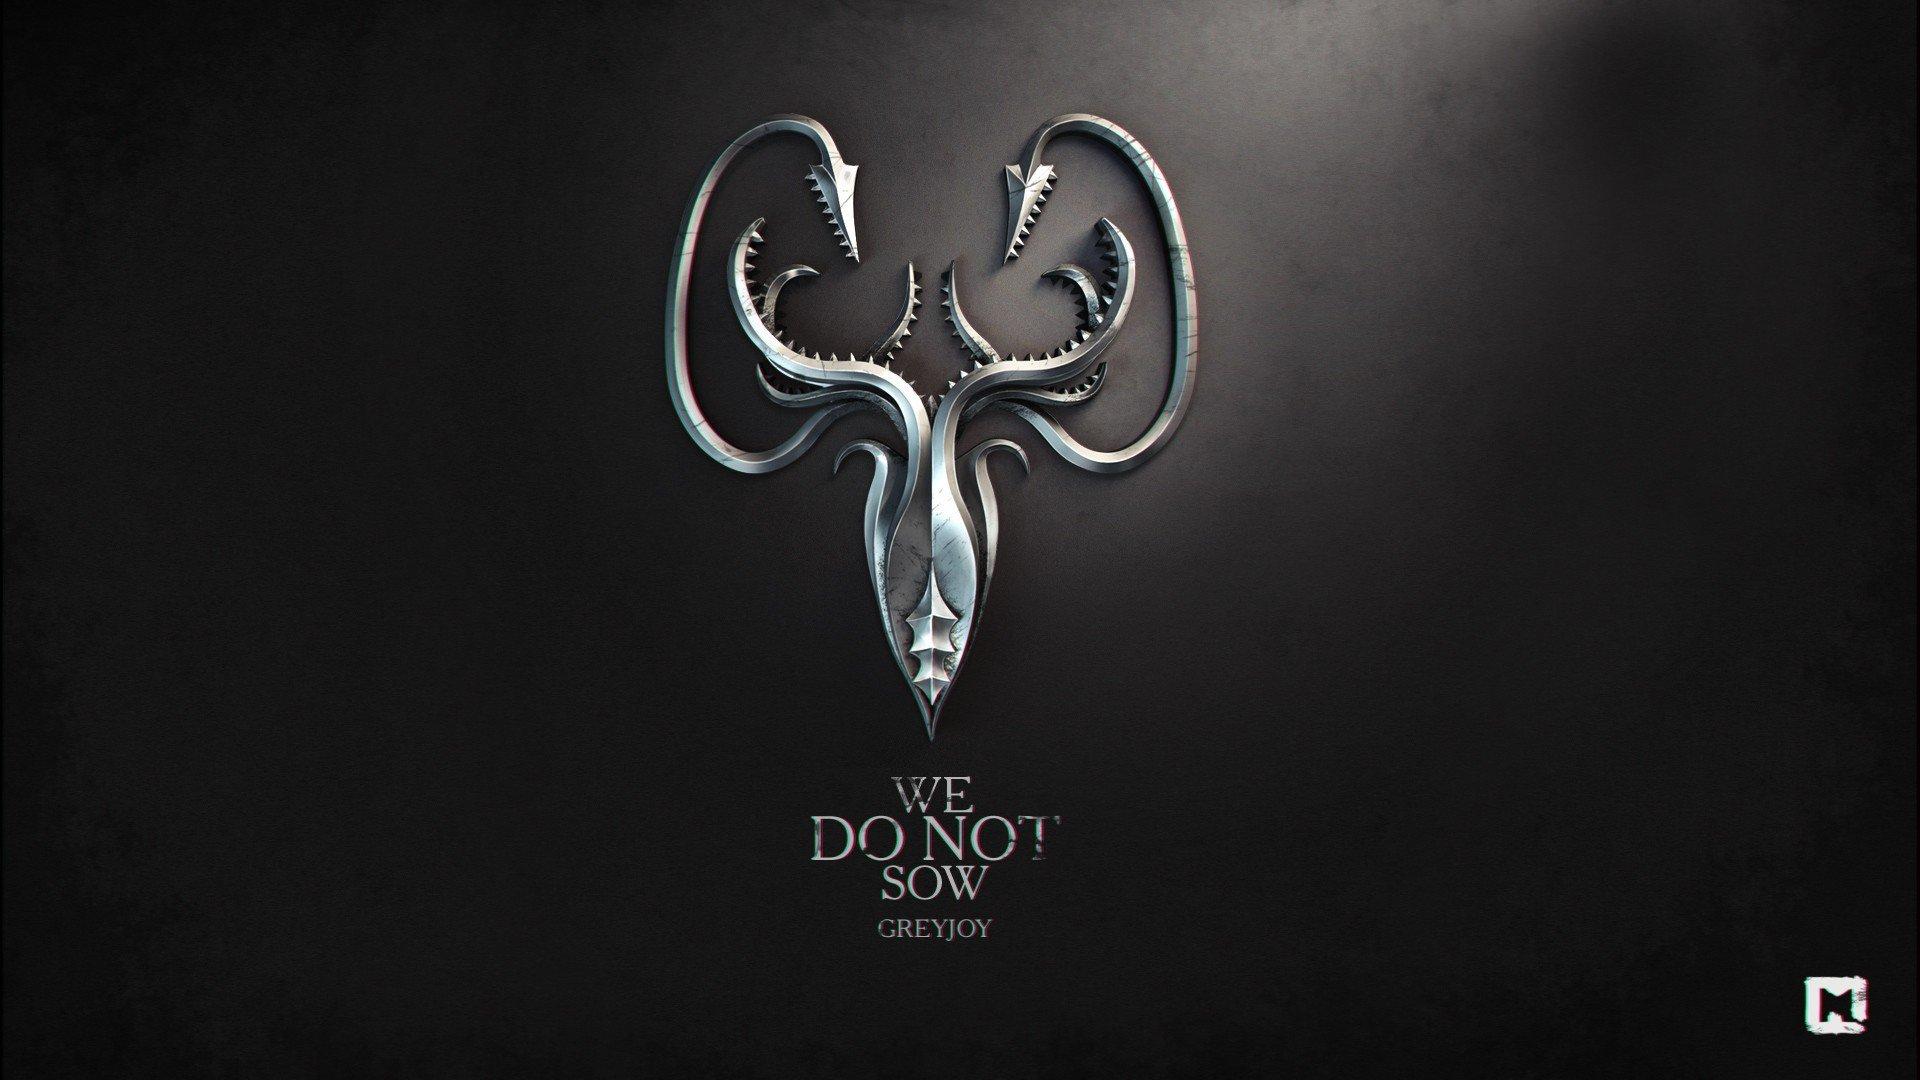 Game-of-Thrones-¡-HD-Megapost-1920x1080-Taringa-wallpaper-wp340398